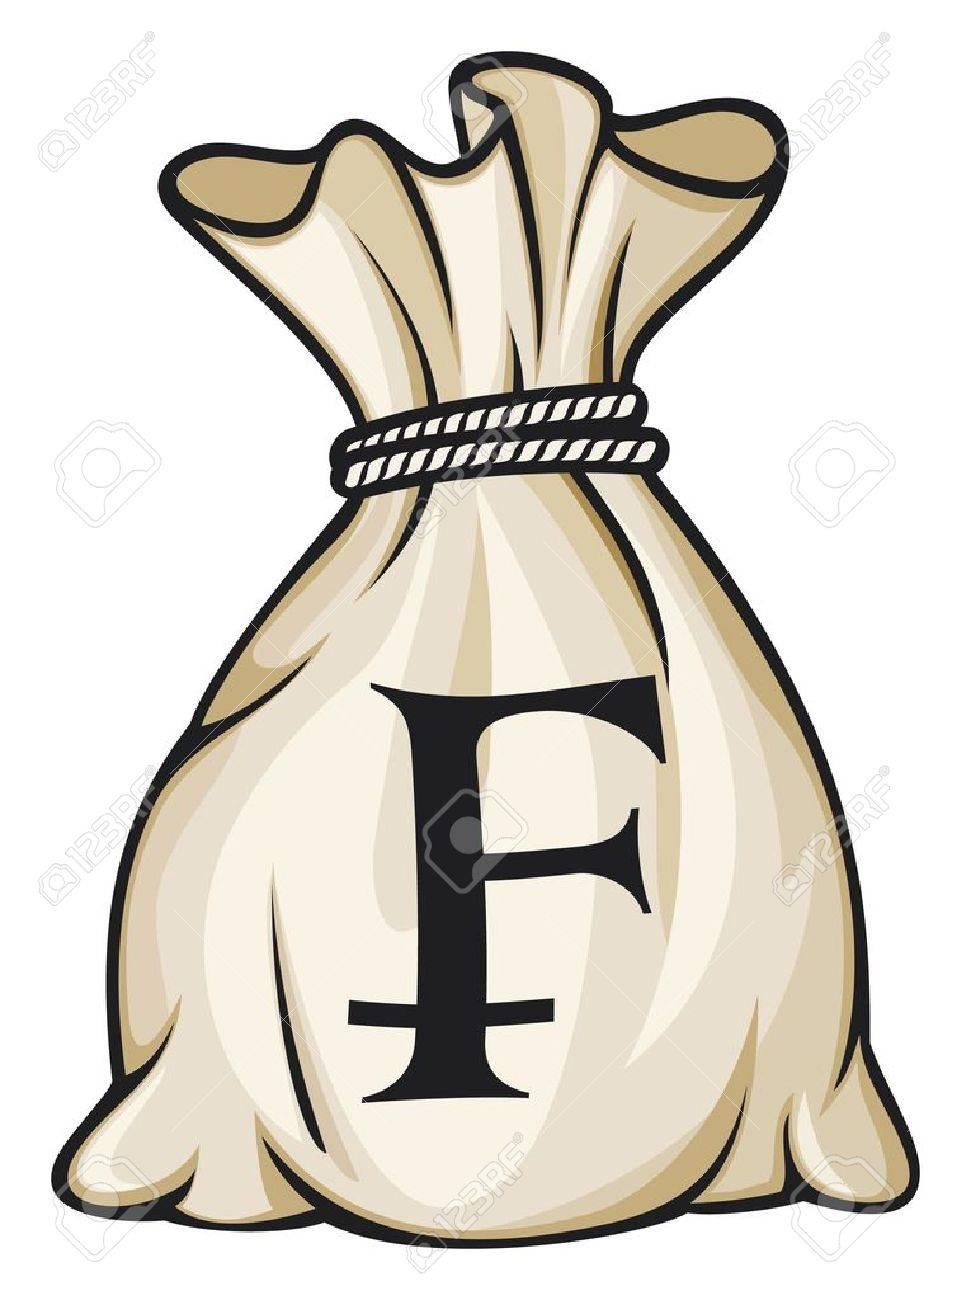 Money Bag with Swiss franc Symbol Stock Vector - 15932845